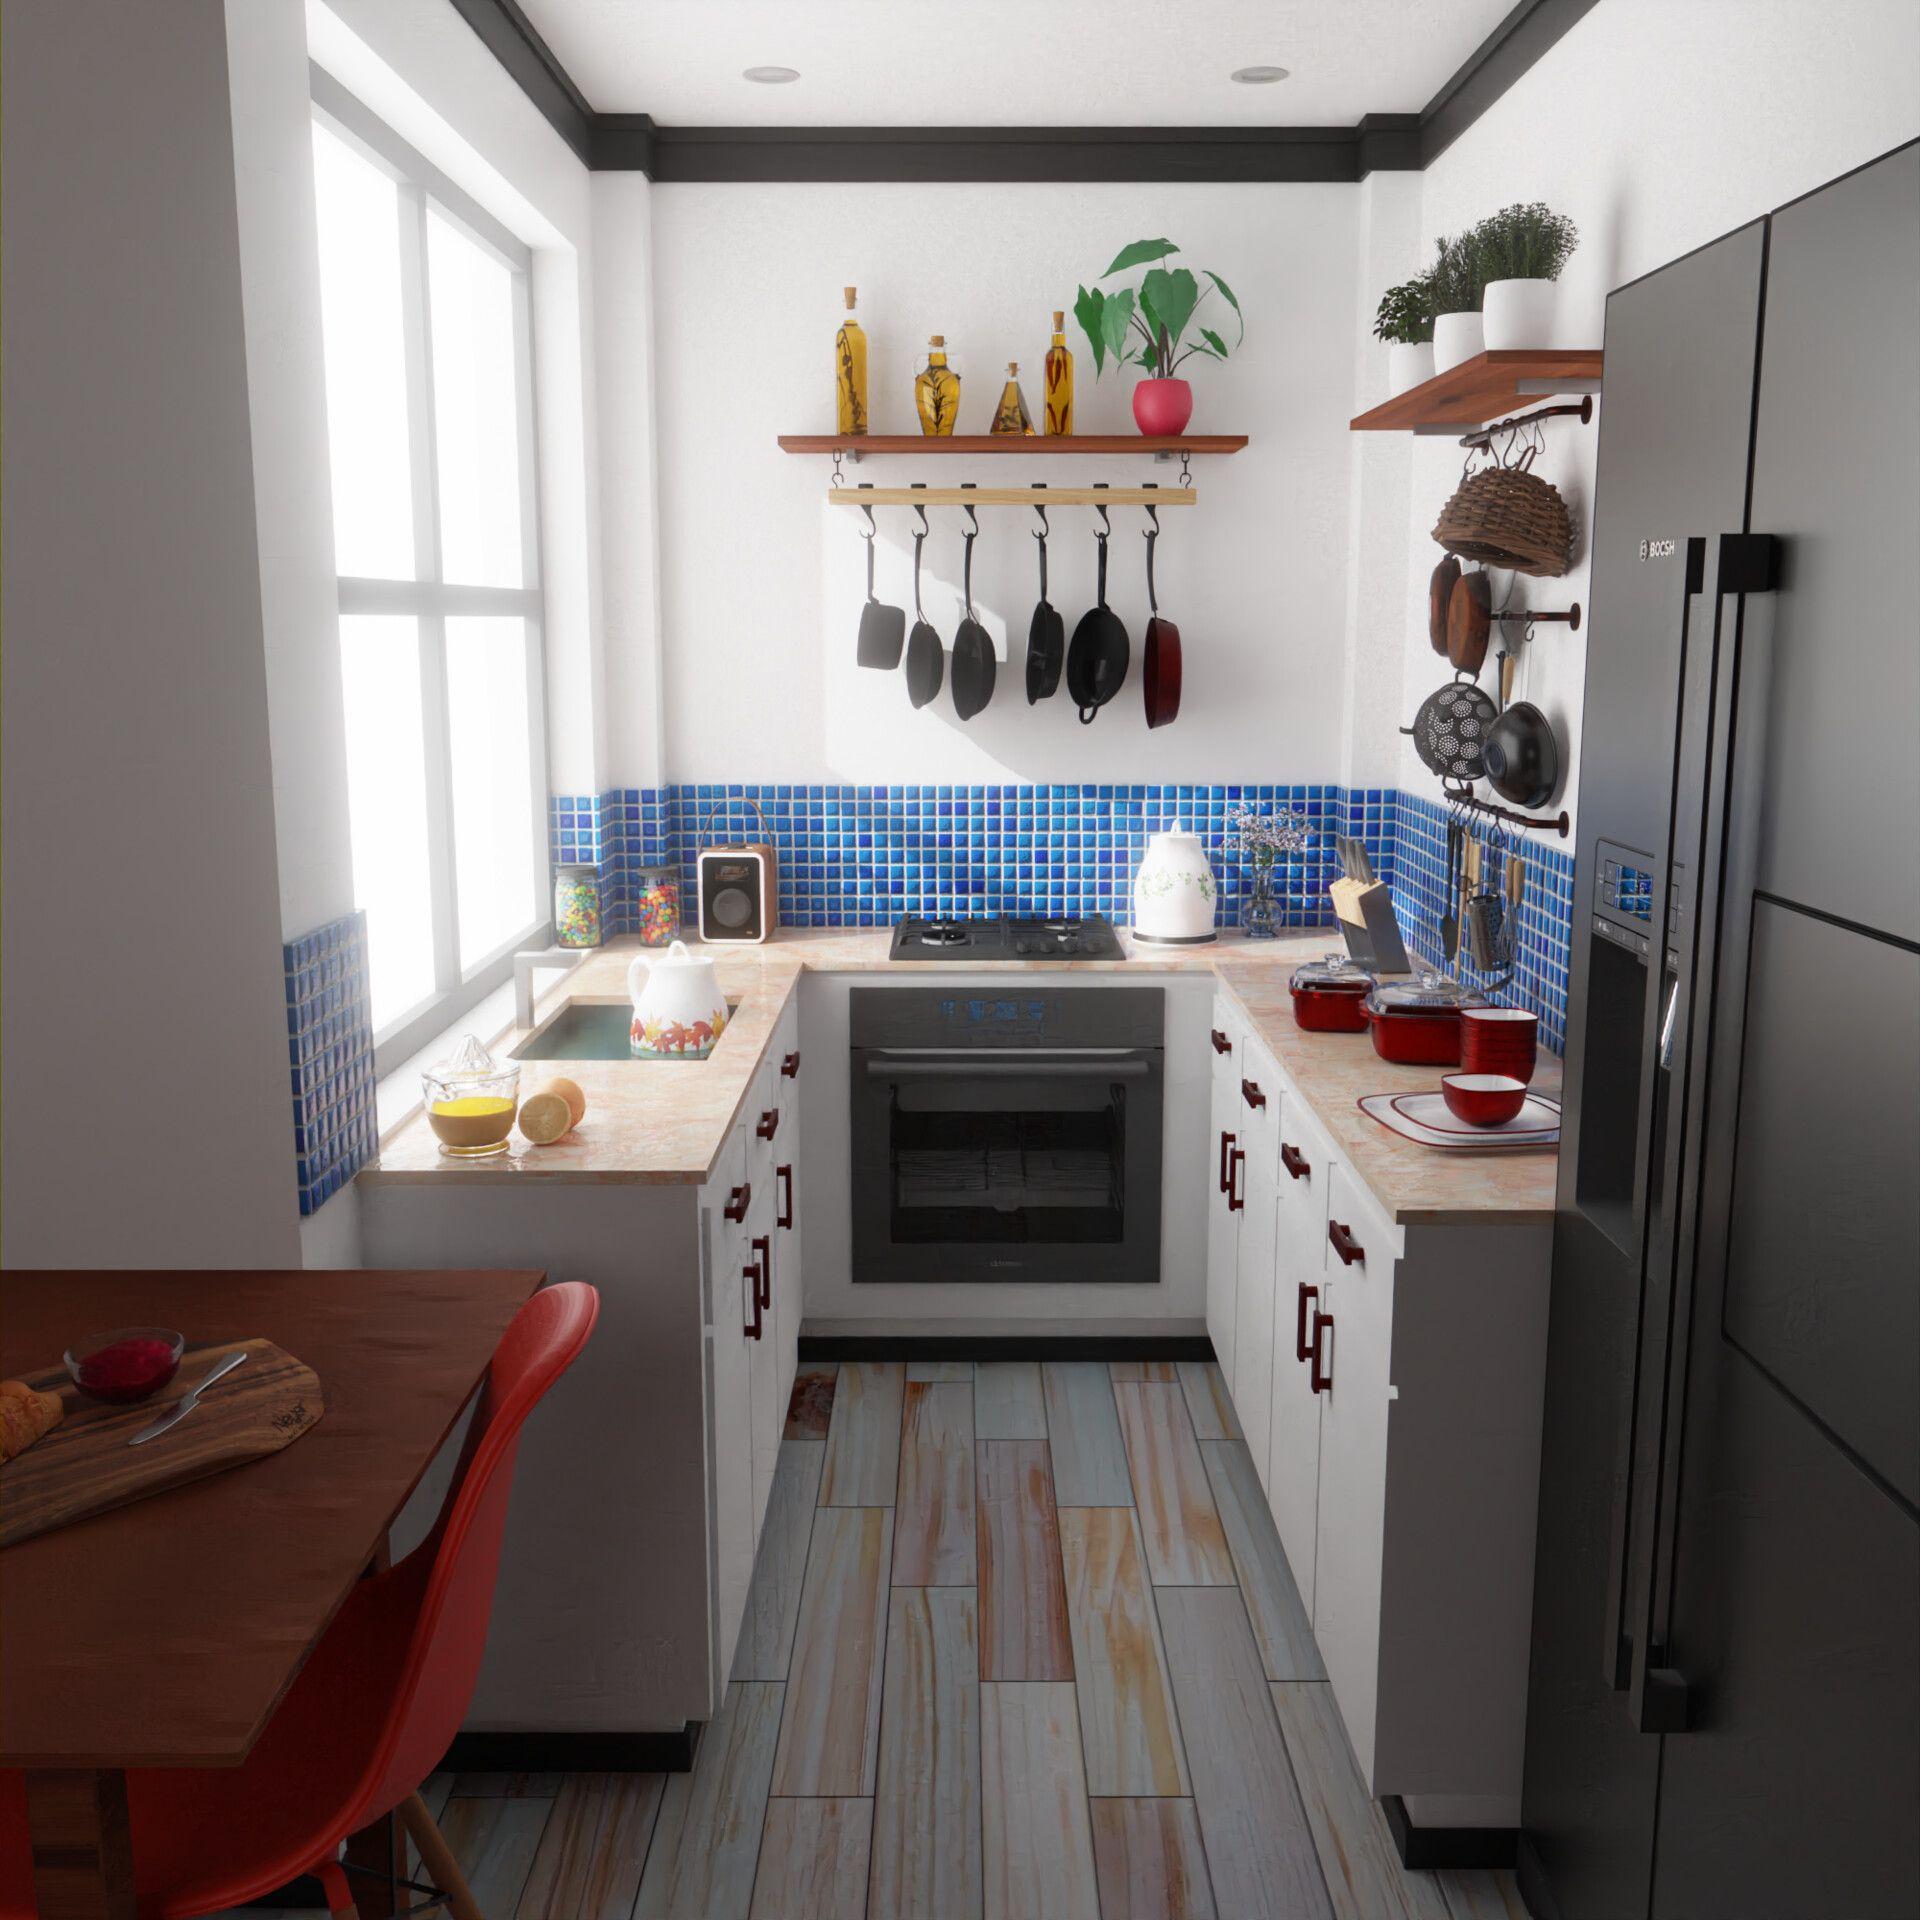 Cozy Rustic Kitchen 20002000 Check out desigedecors.com ...